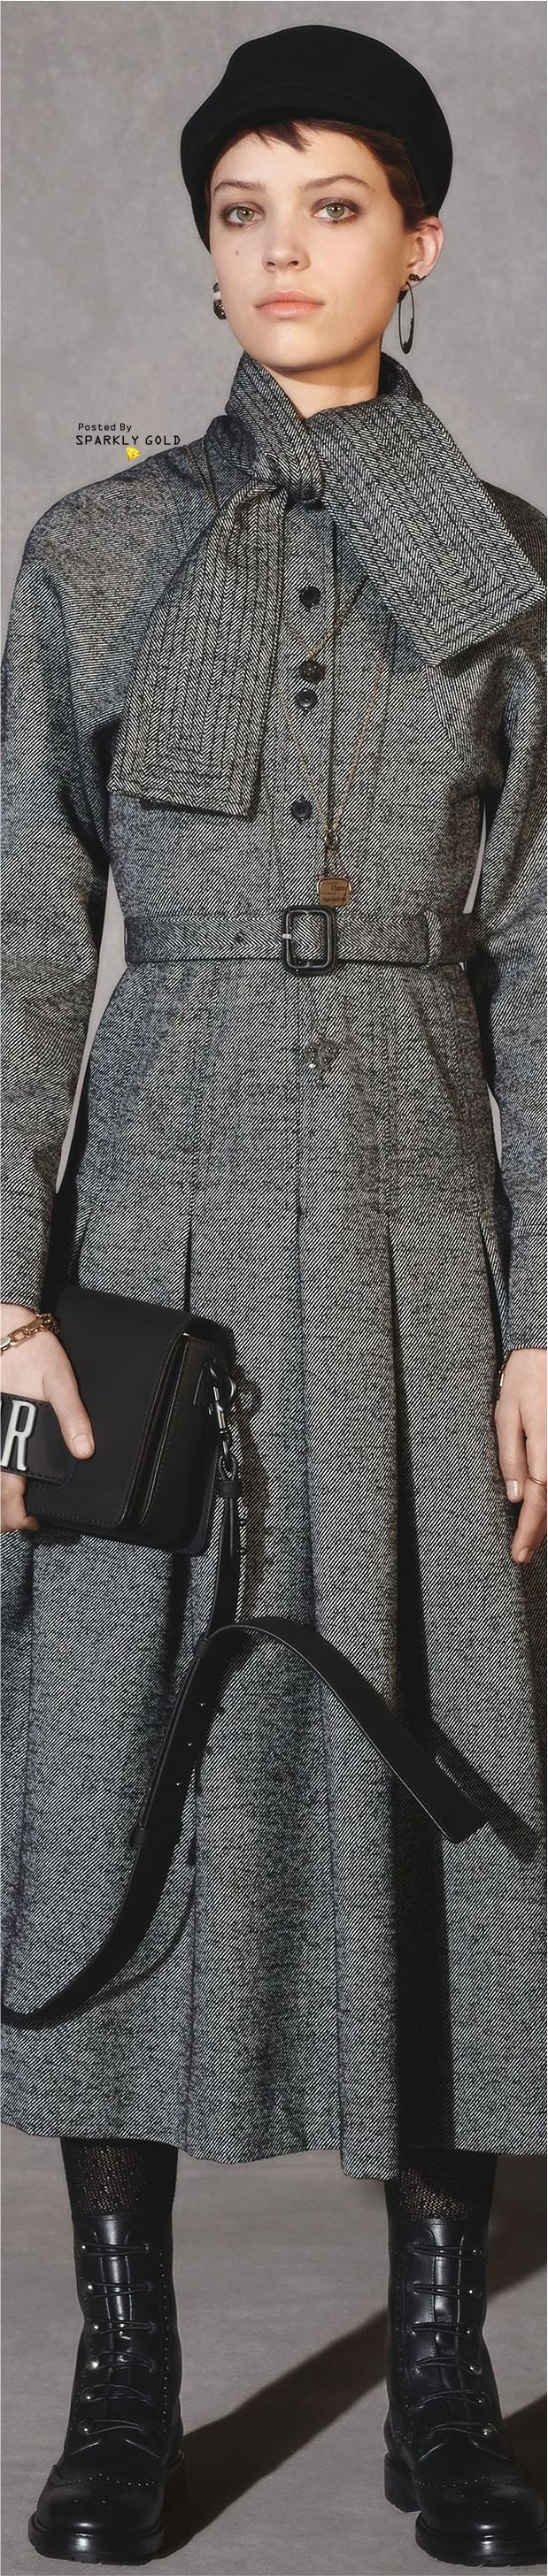 Christian Dior Pre-Fall 2018